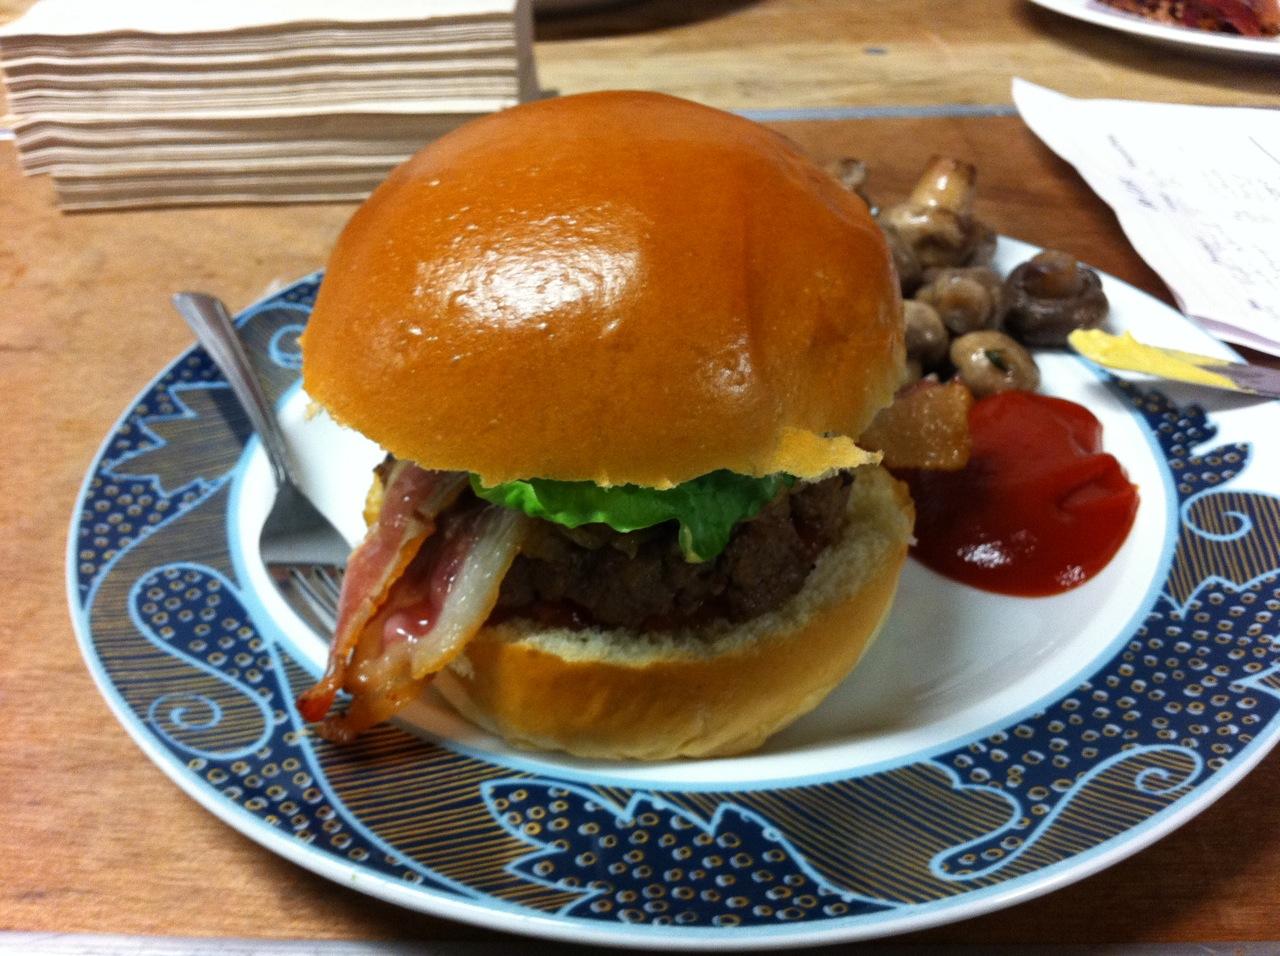 2012-02-28-BurgerFamilyMeal.jpg